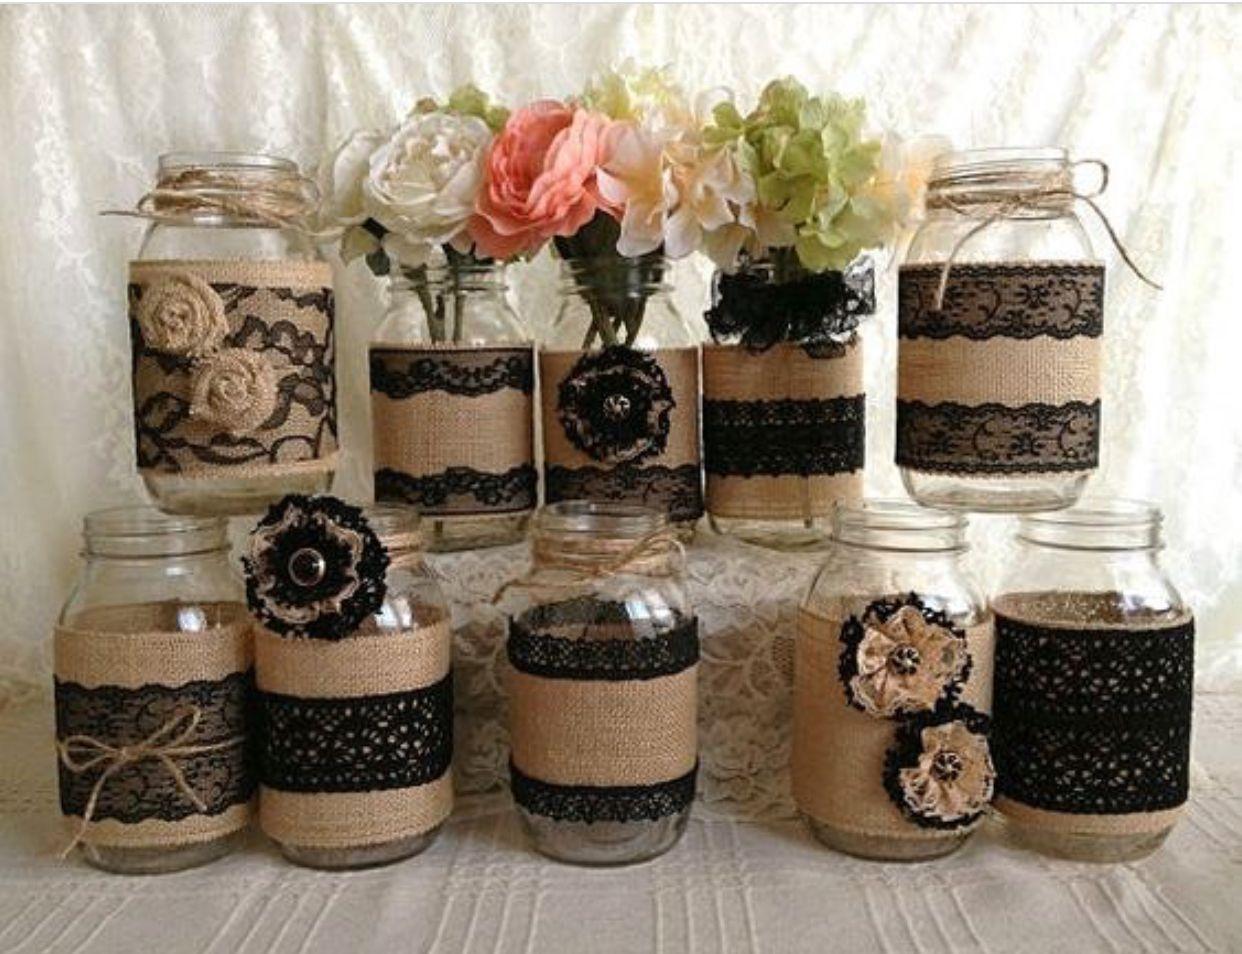 pingl par jackiee sierra sur jacquelyn lionel 39 s rustic wedding pinterest. Black Bedroom Furniture Sets. Home Design Ideas